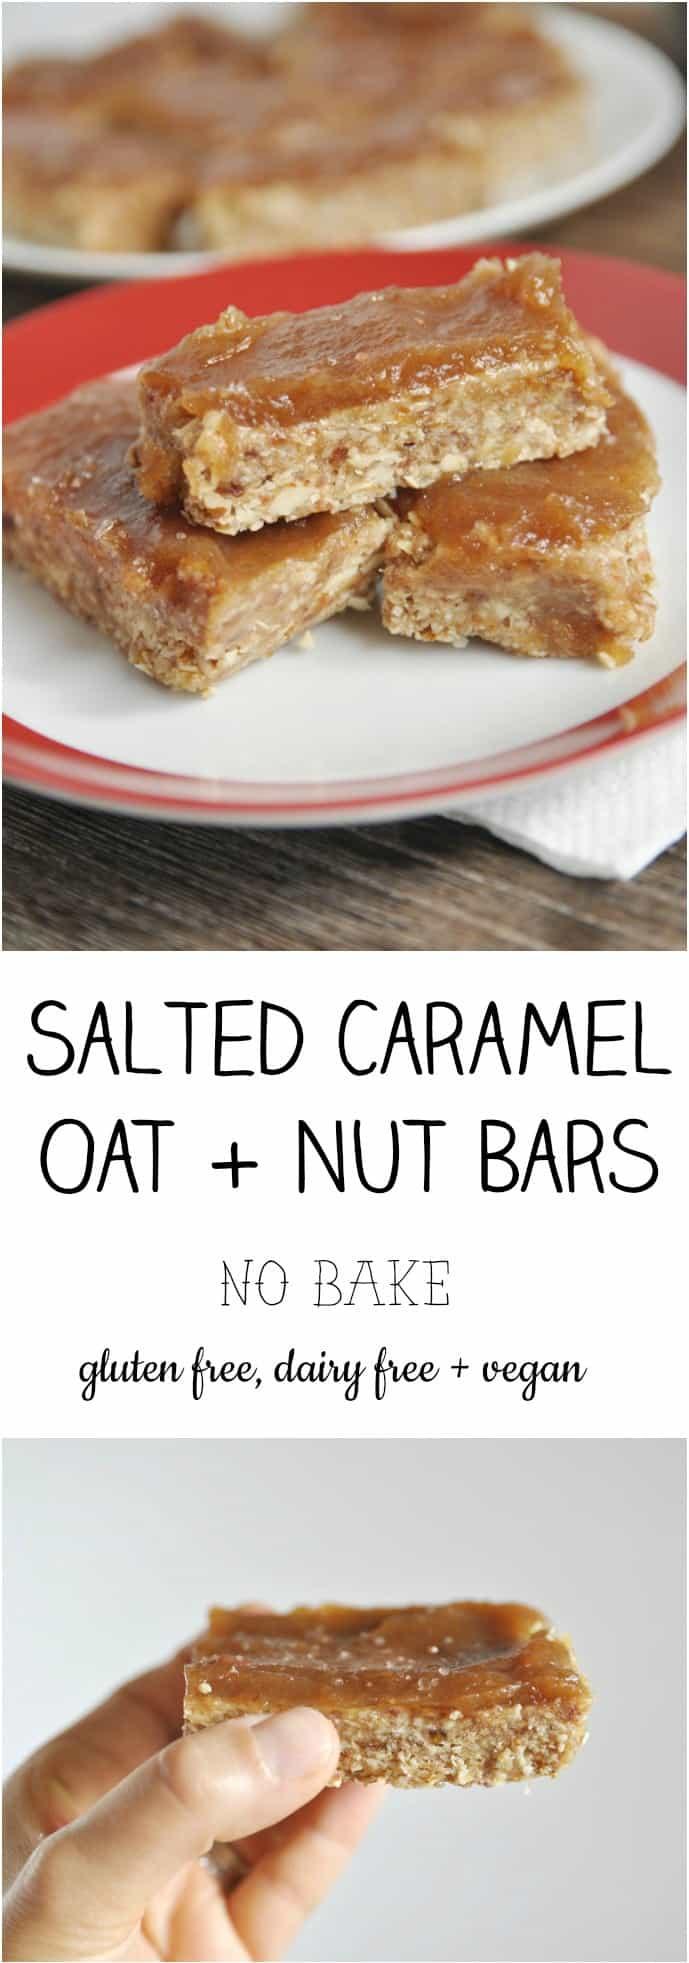 Salted Caramel Oat Nut Bars